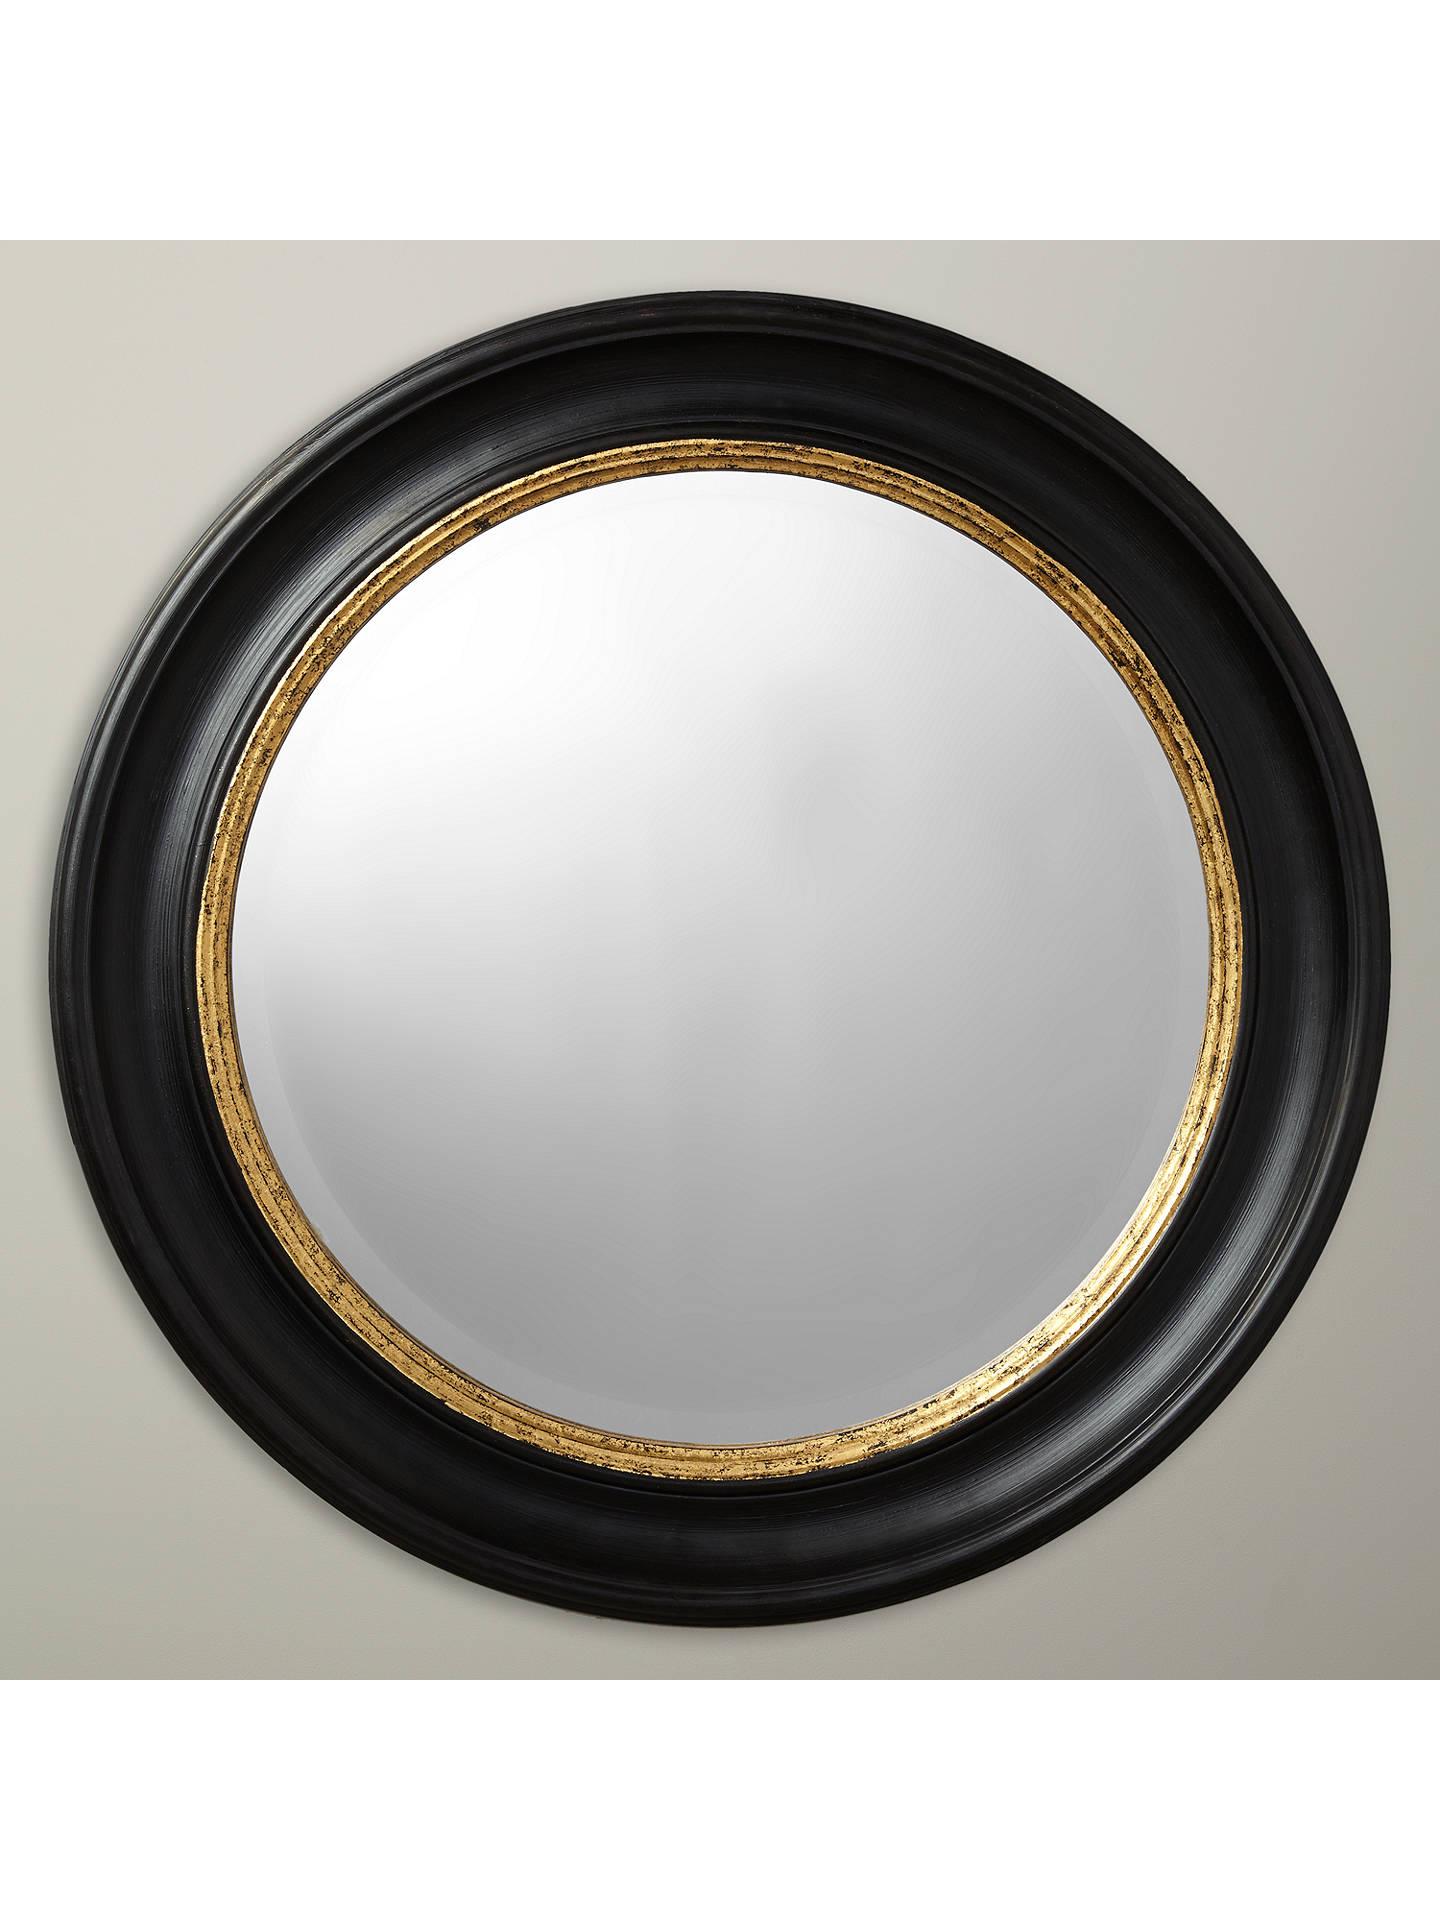 John Lewis & Partners Circle Wall Mirror, Dia.68cm, Black/Gold by John Lewis & Partners